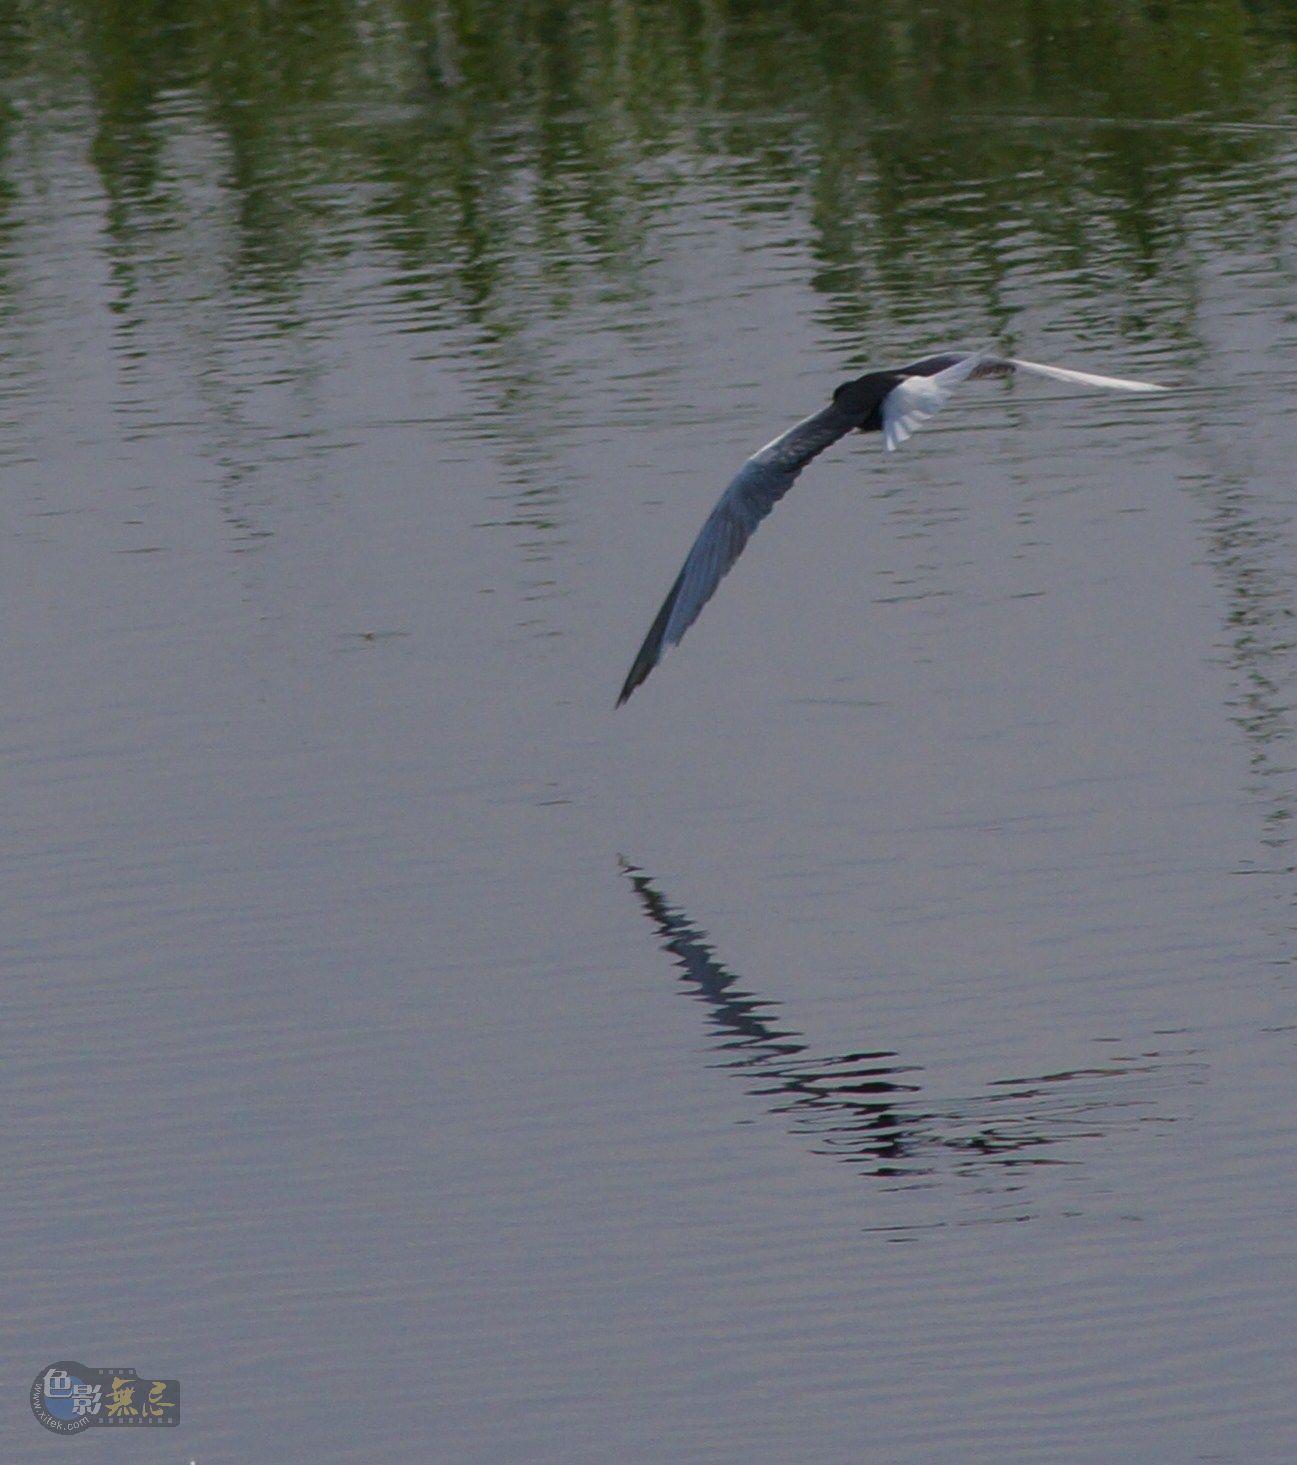 kevin060作品:湿地中的鸥鸟